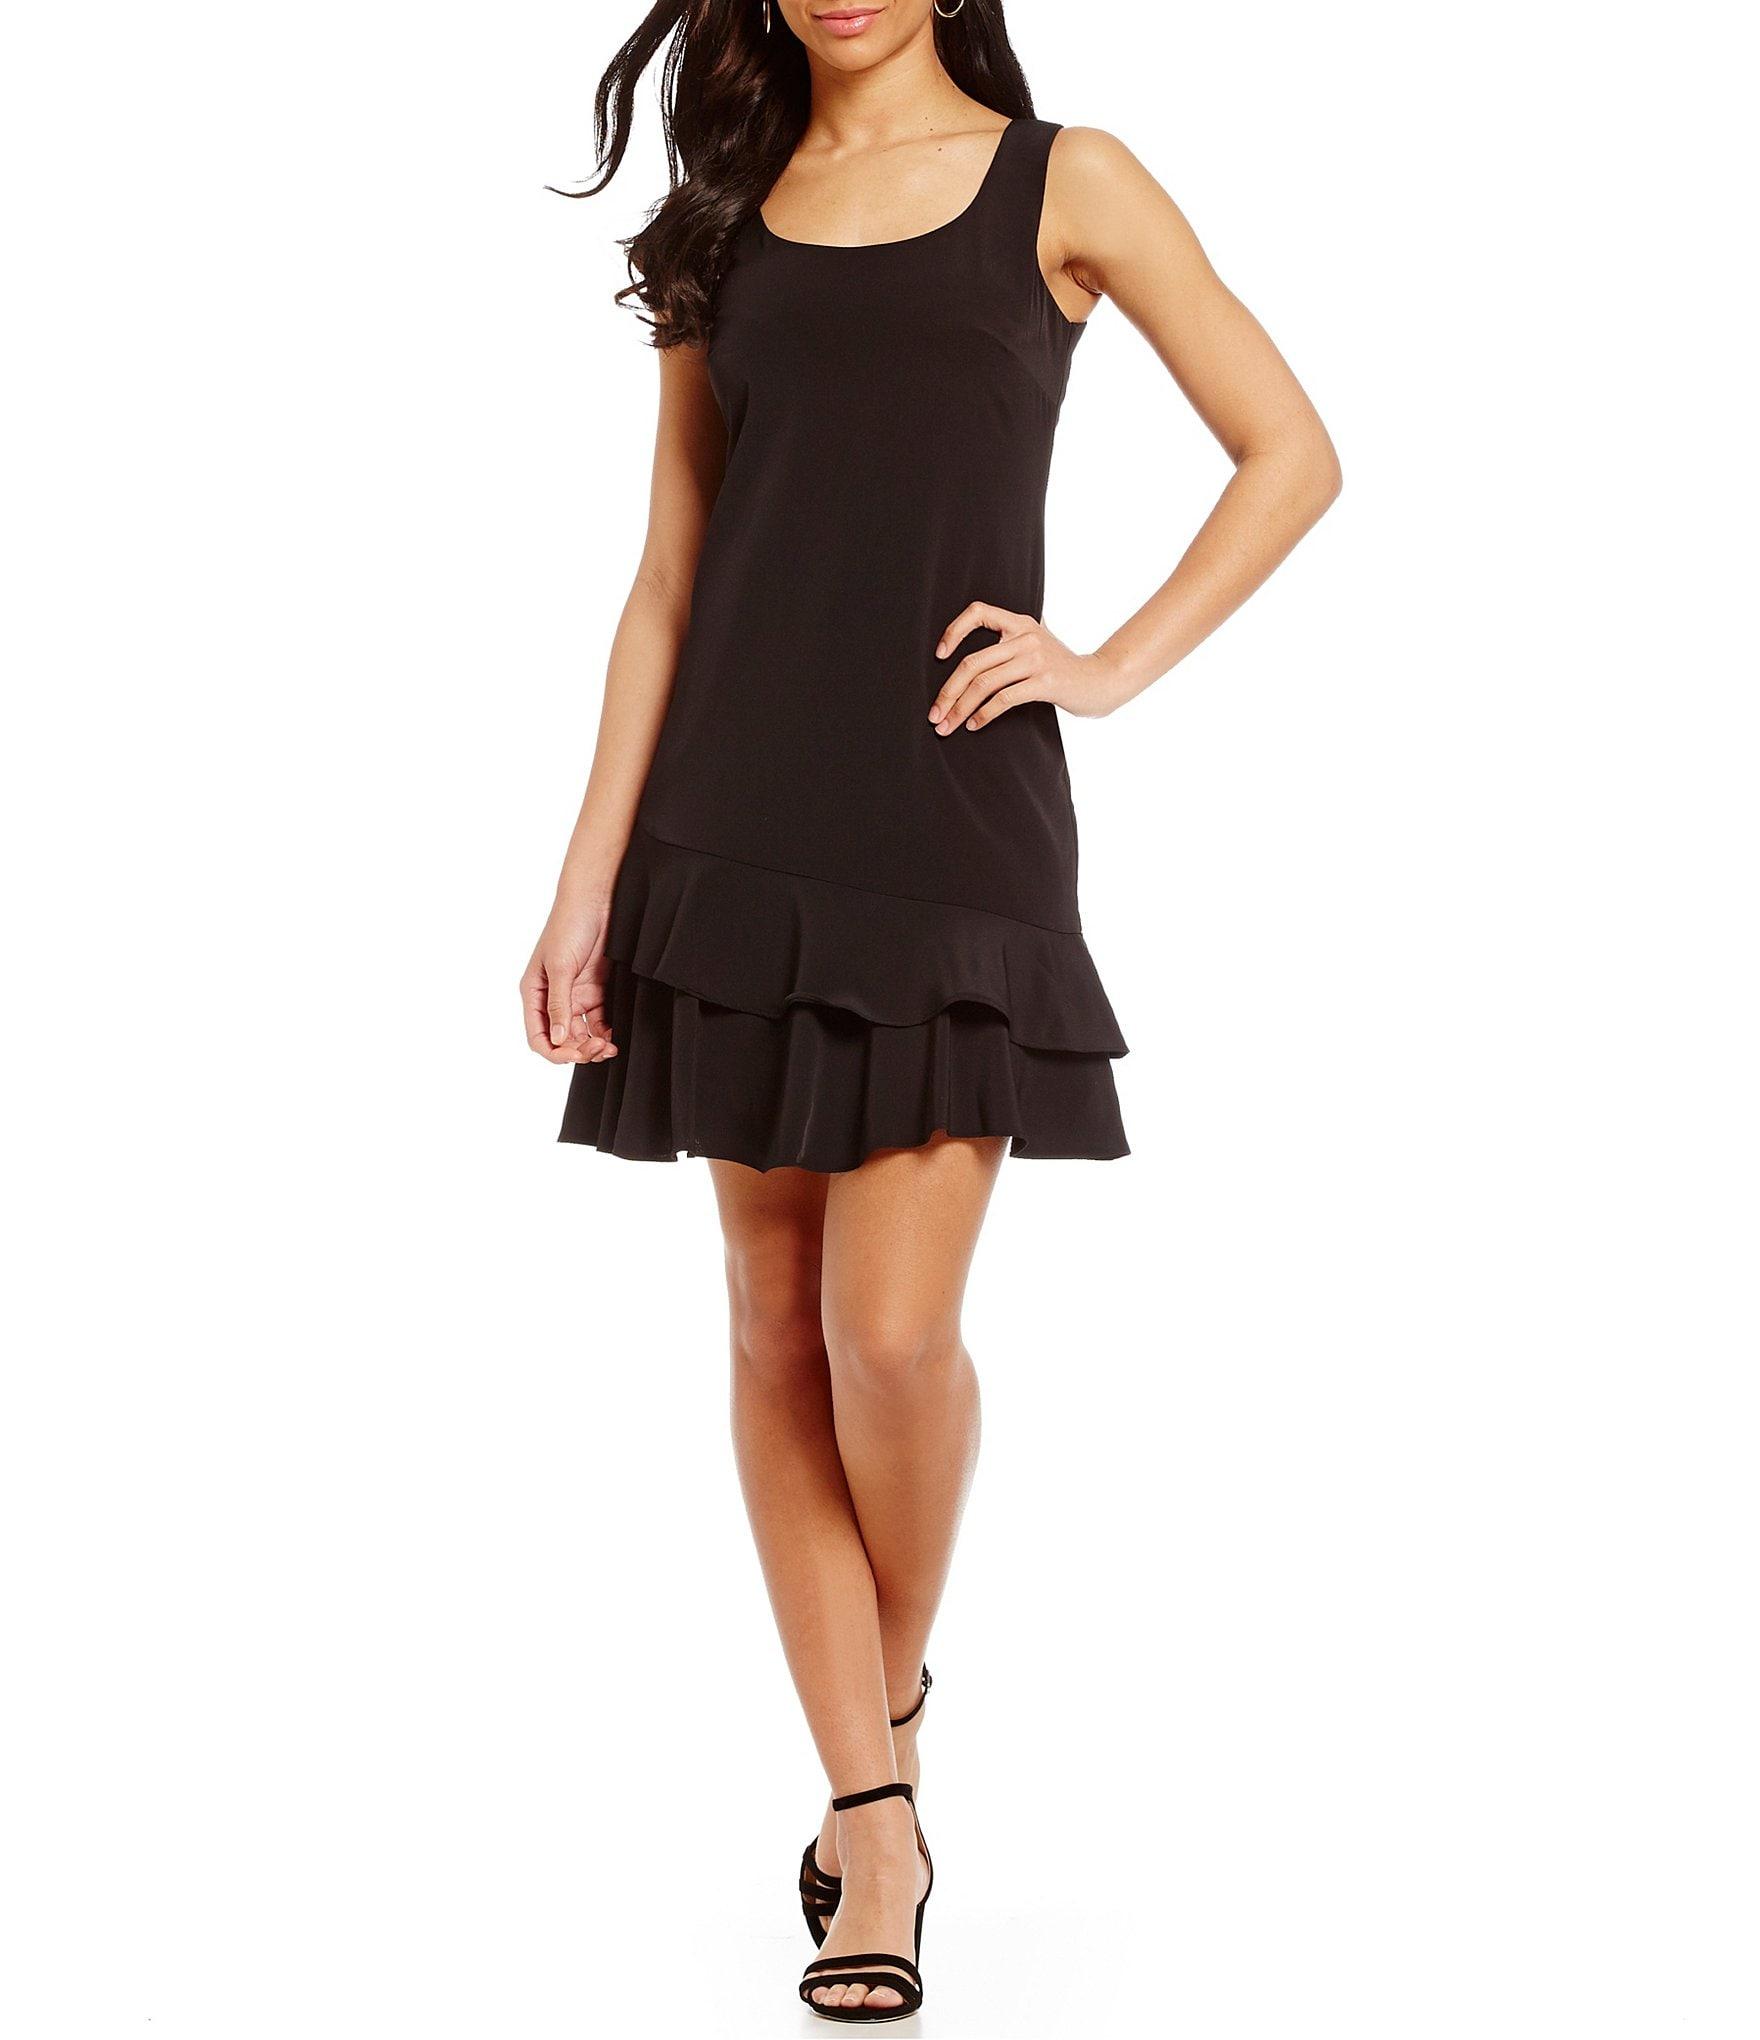 Black dress jcpenney - Black Dress Jcpenney 49